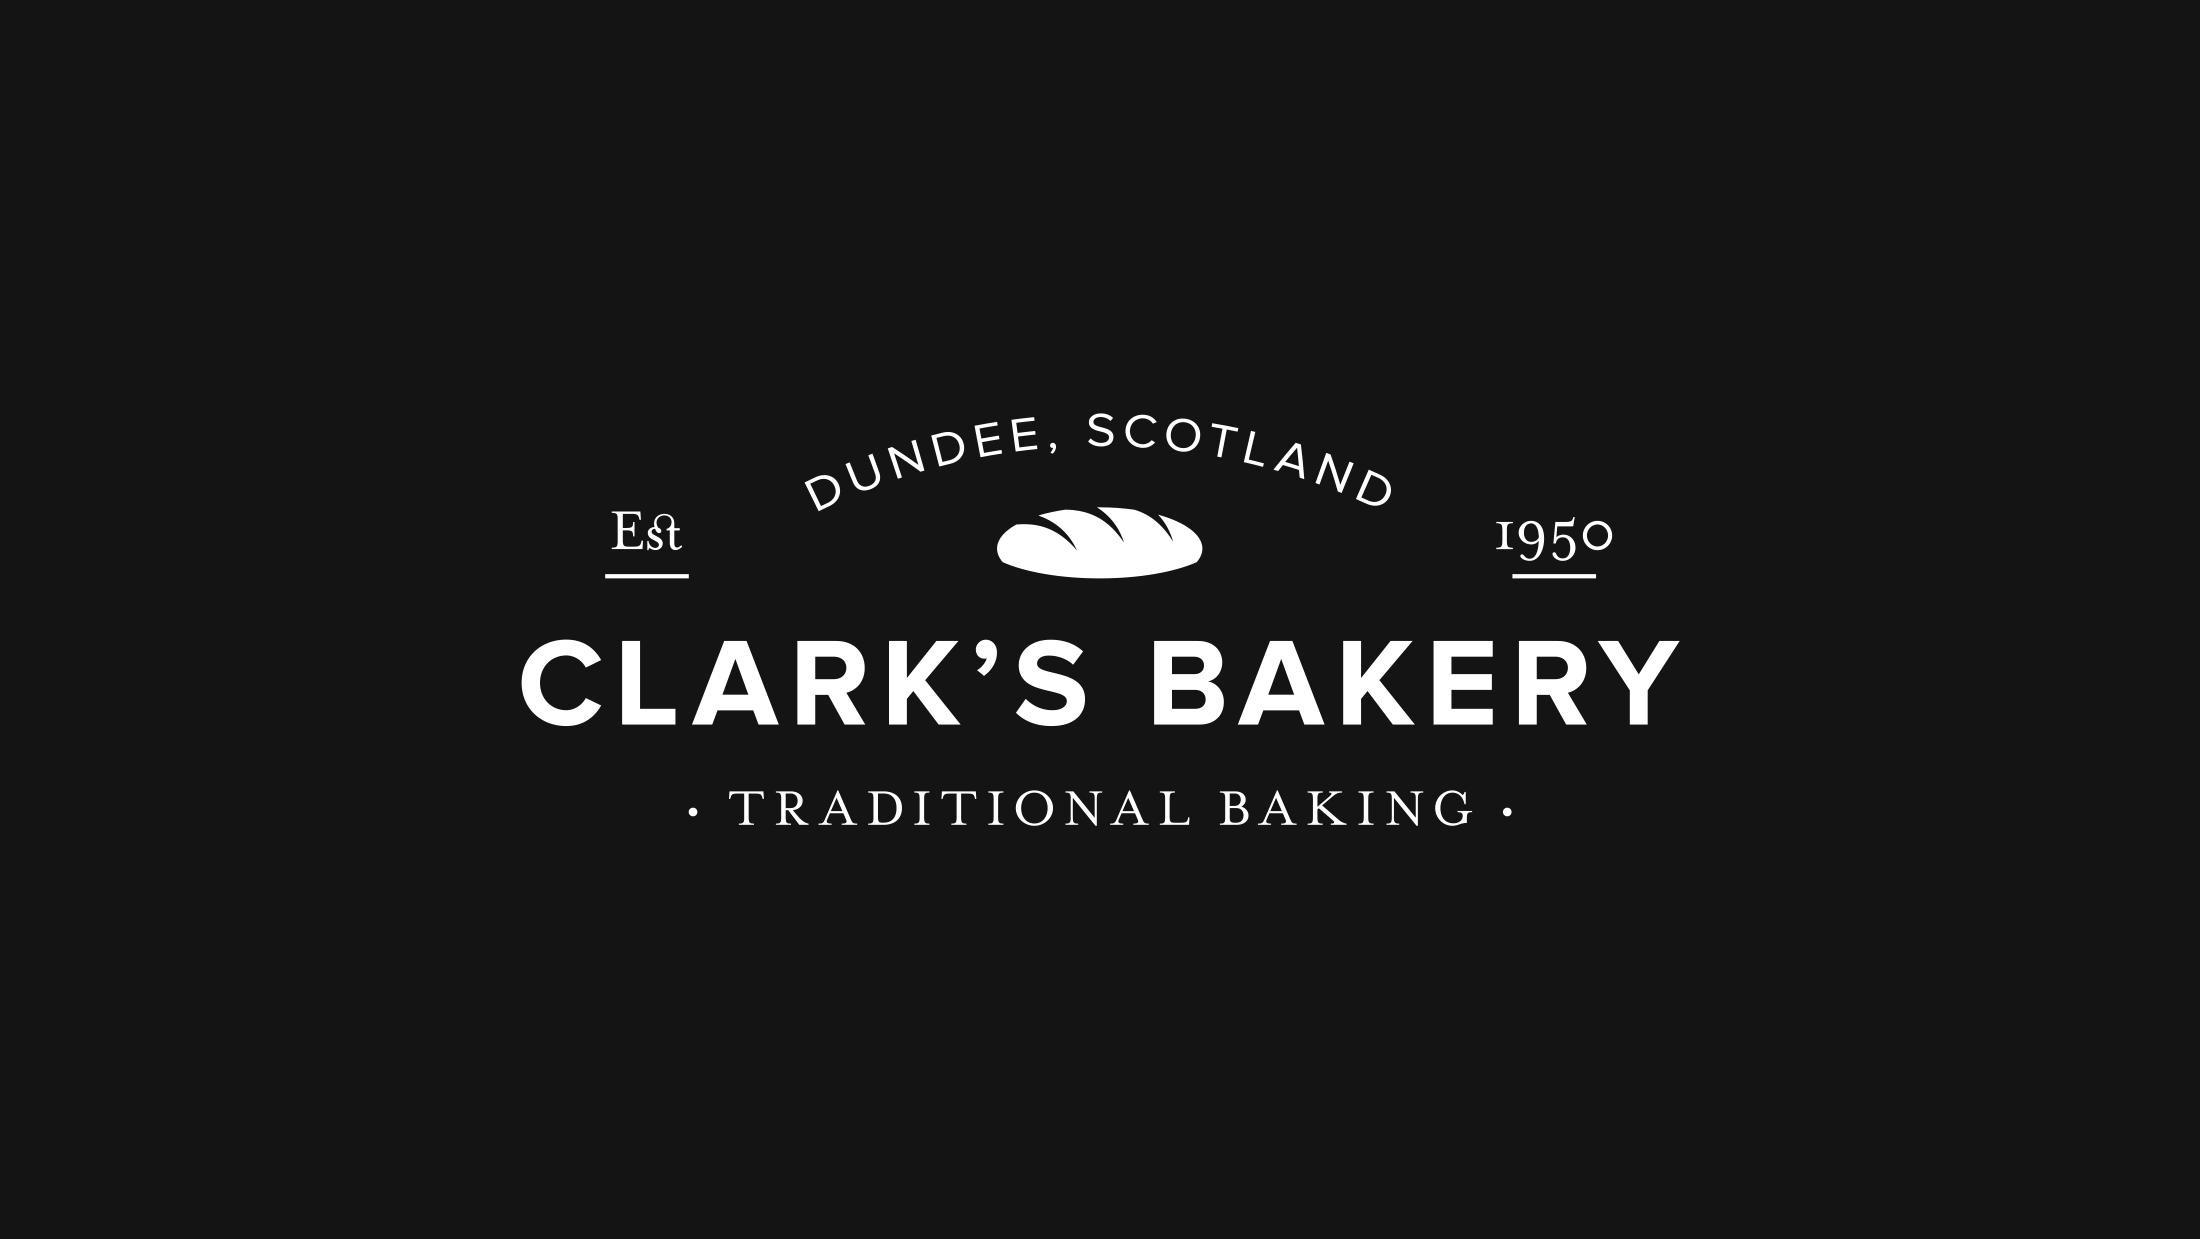 White Clark's Bakery logo on a black background